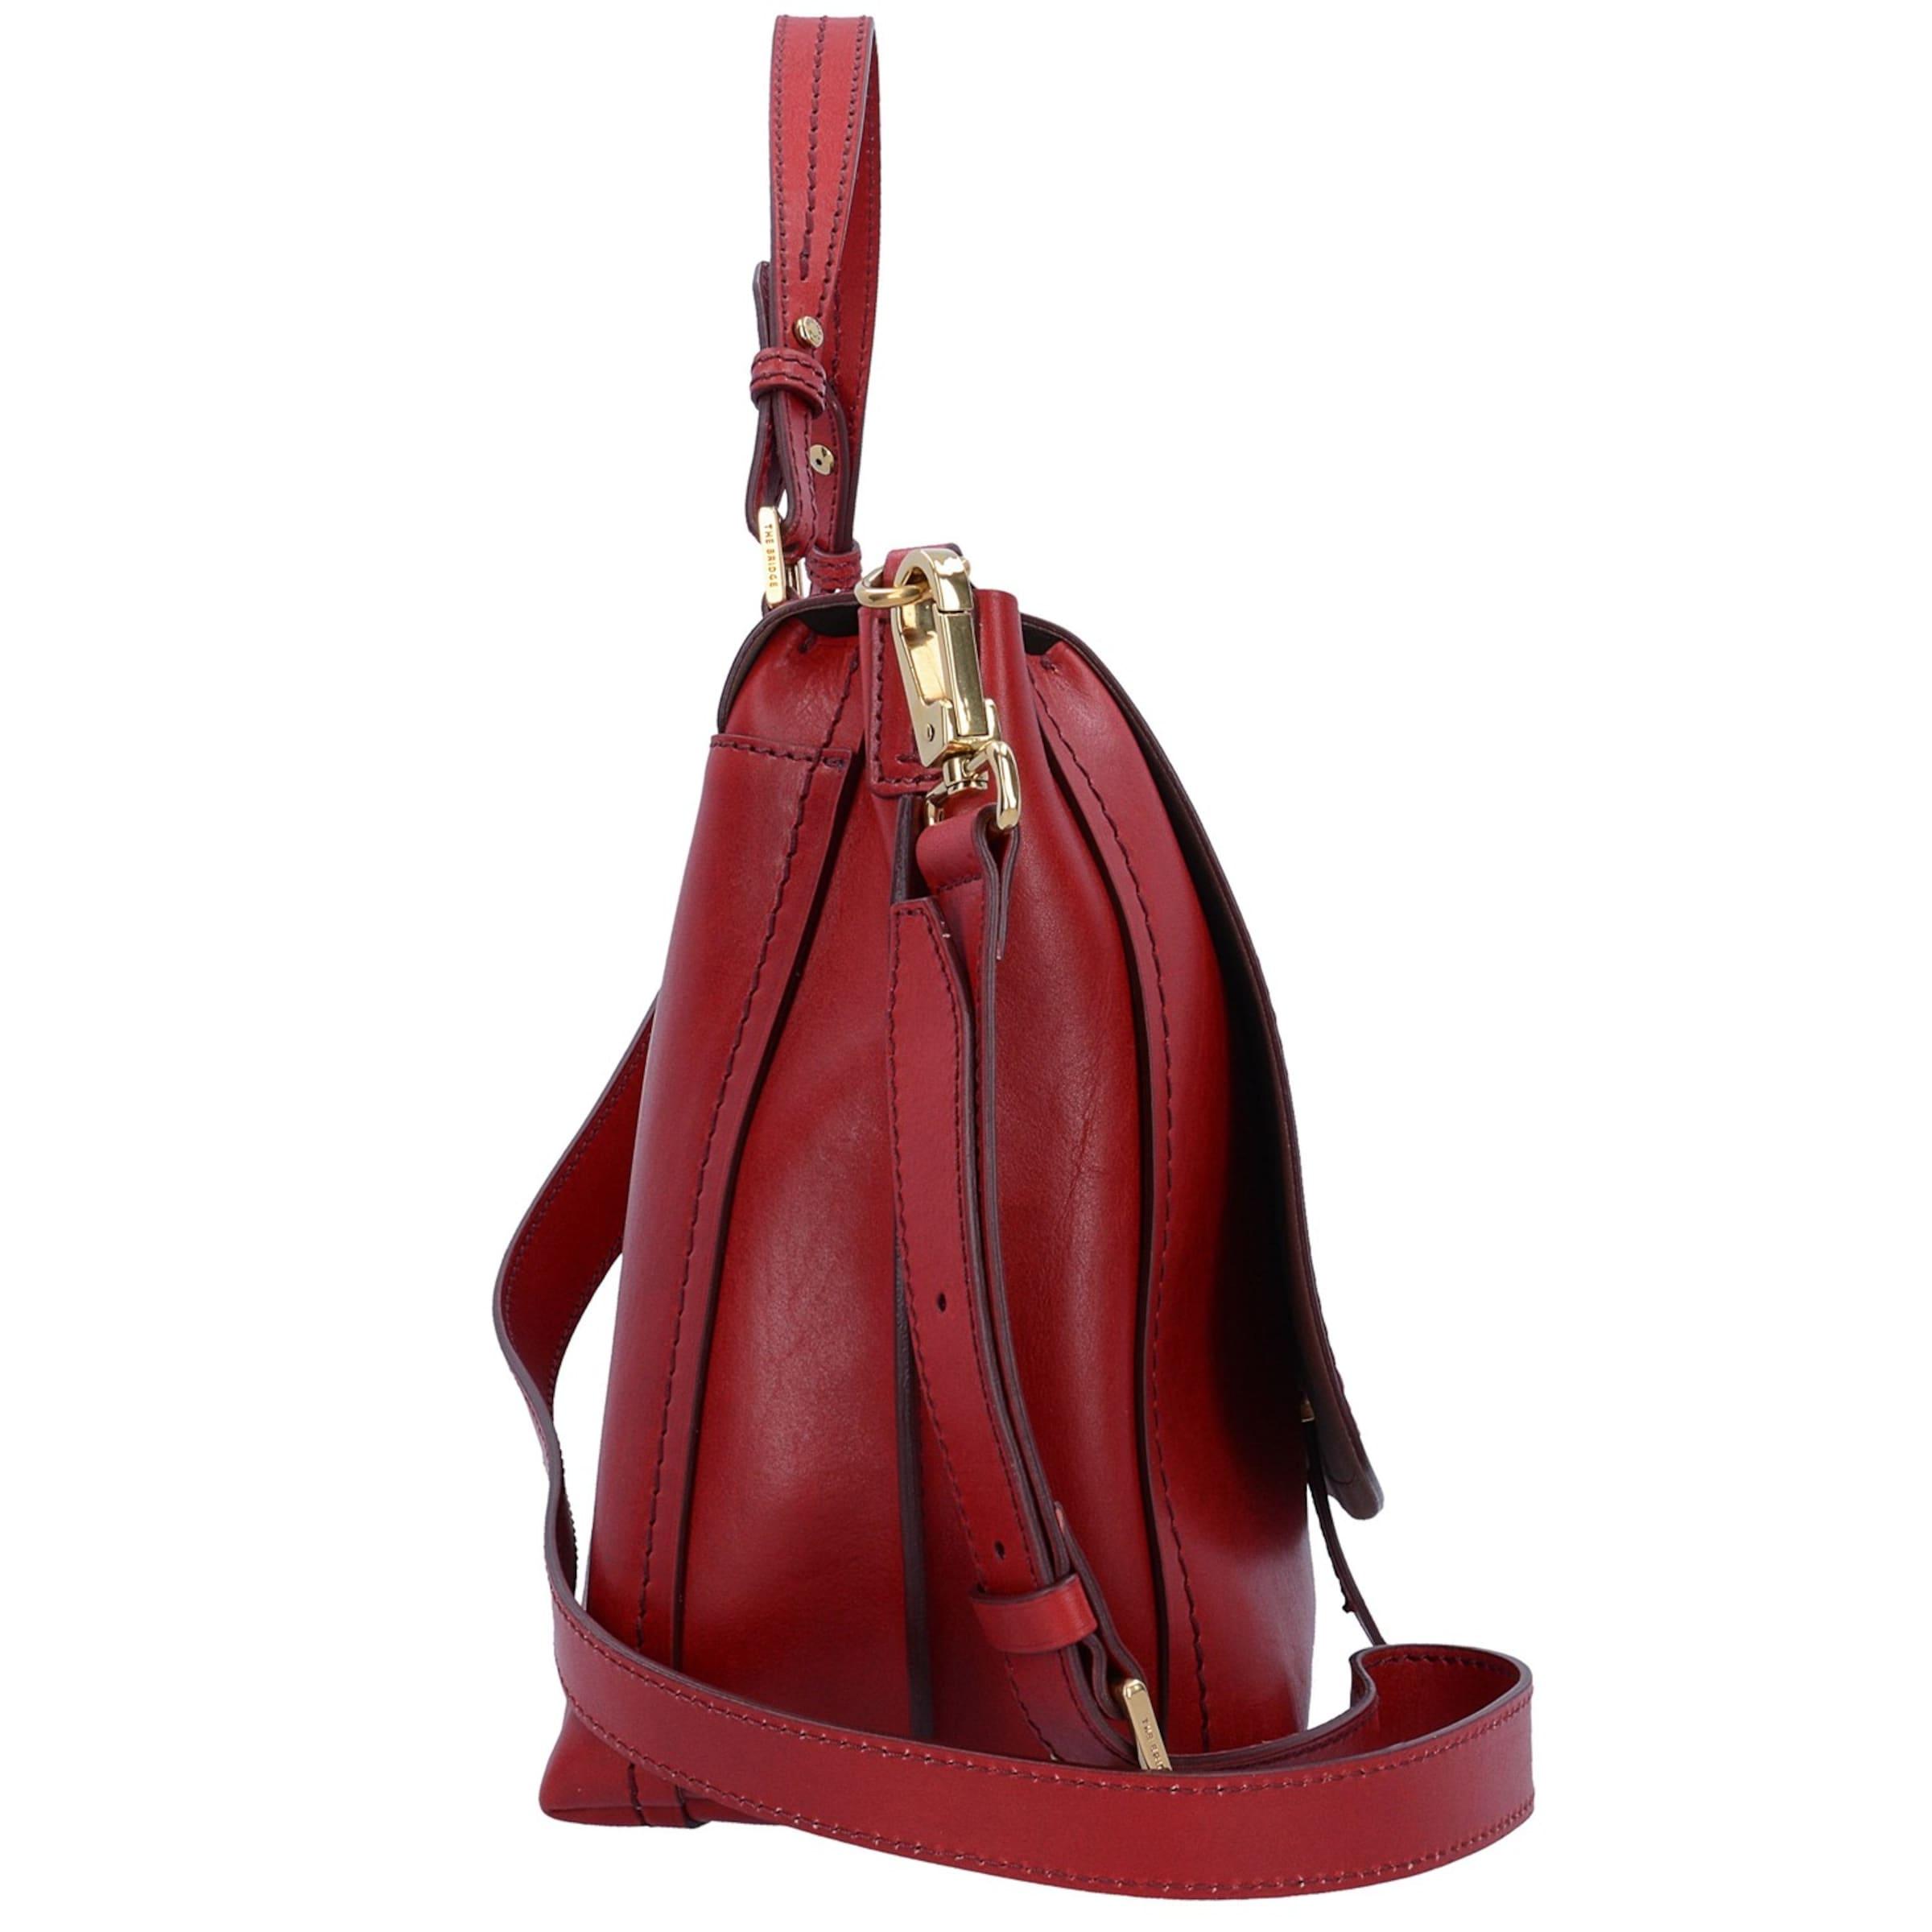 The In Bridge Leder Handtasche Rot Cm 37 Dalston CsQdhtr